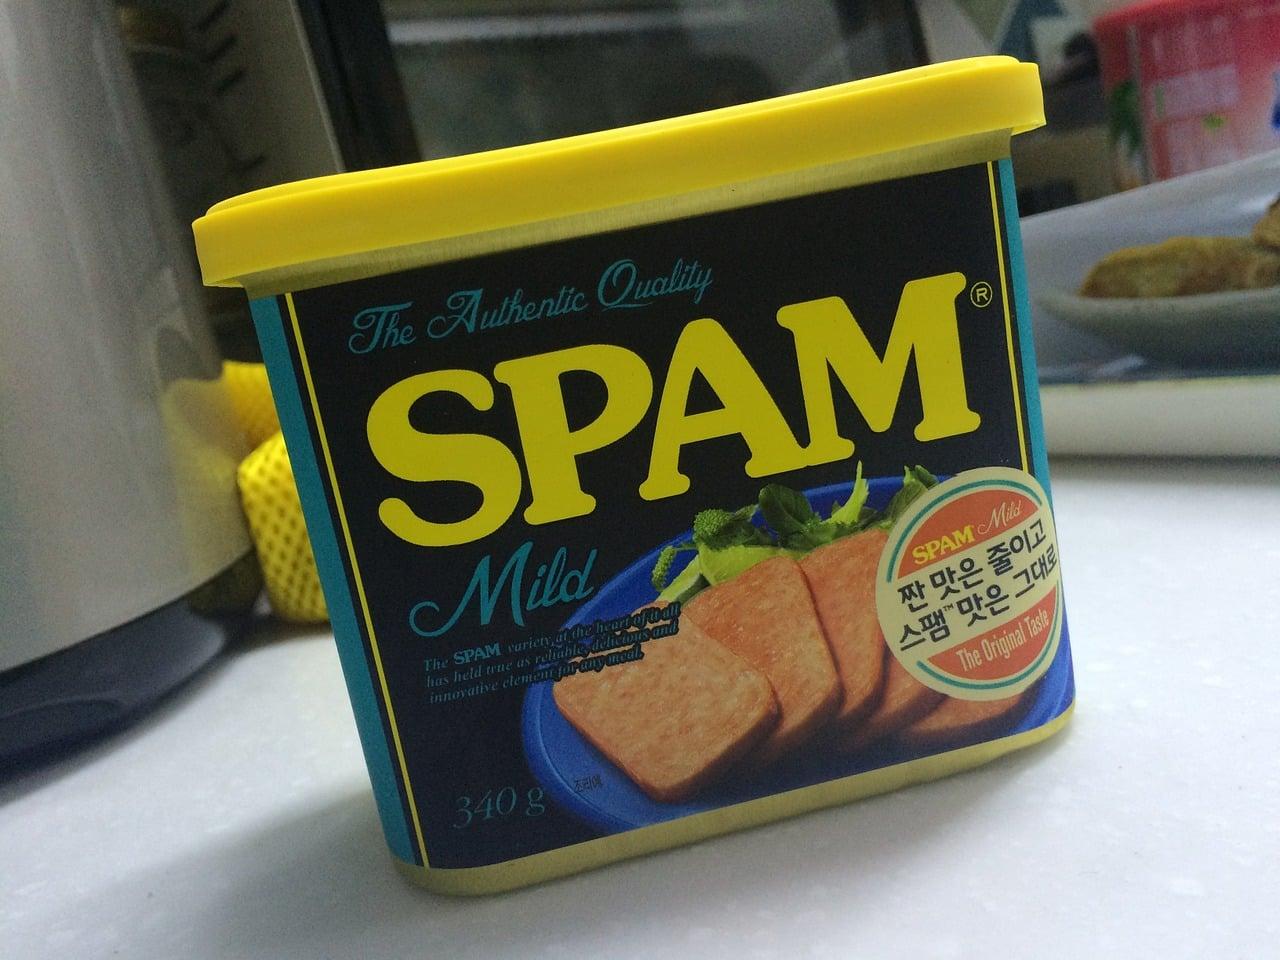 Altospam : une solution antispam efficace